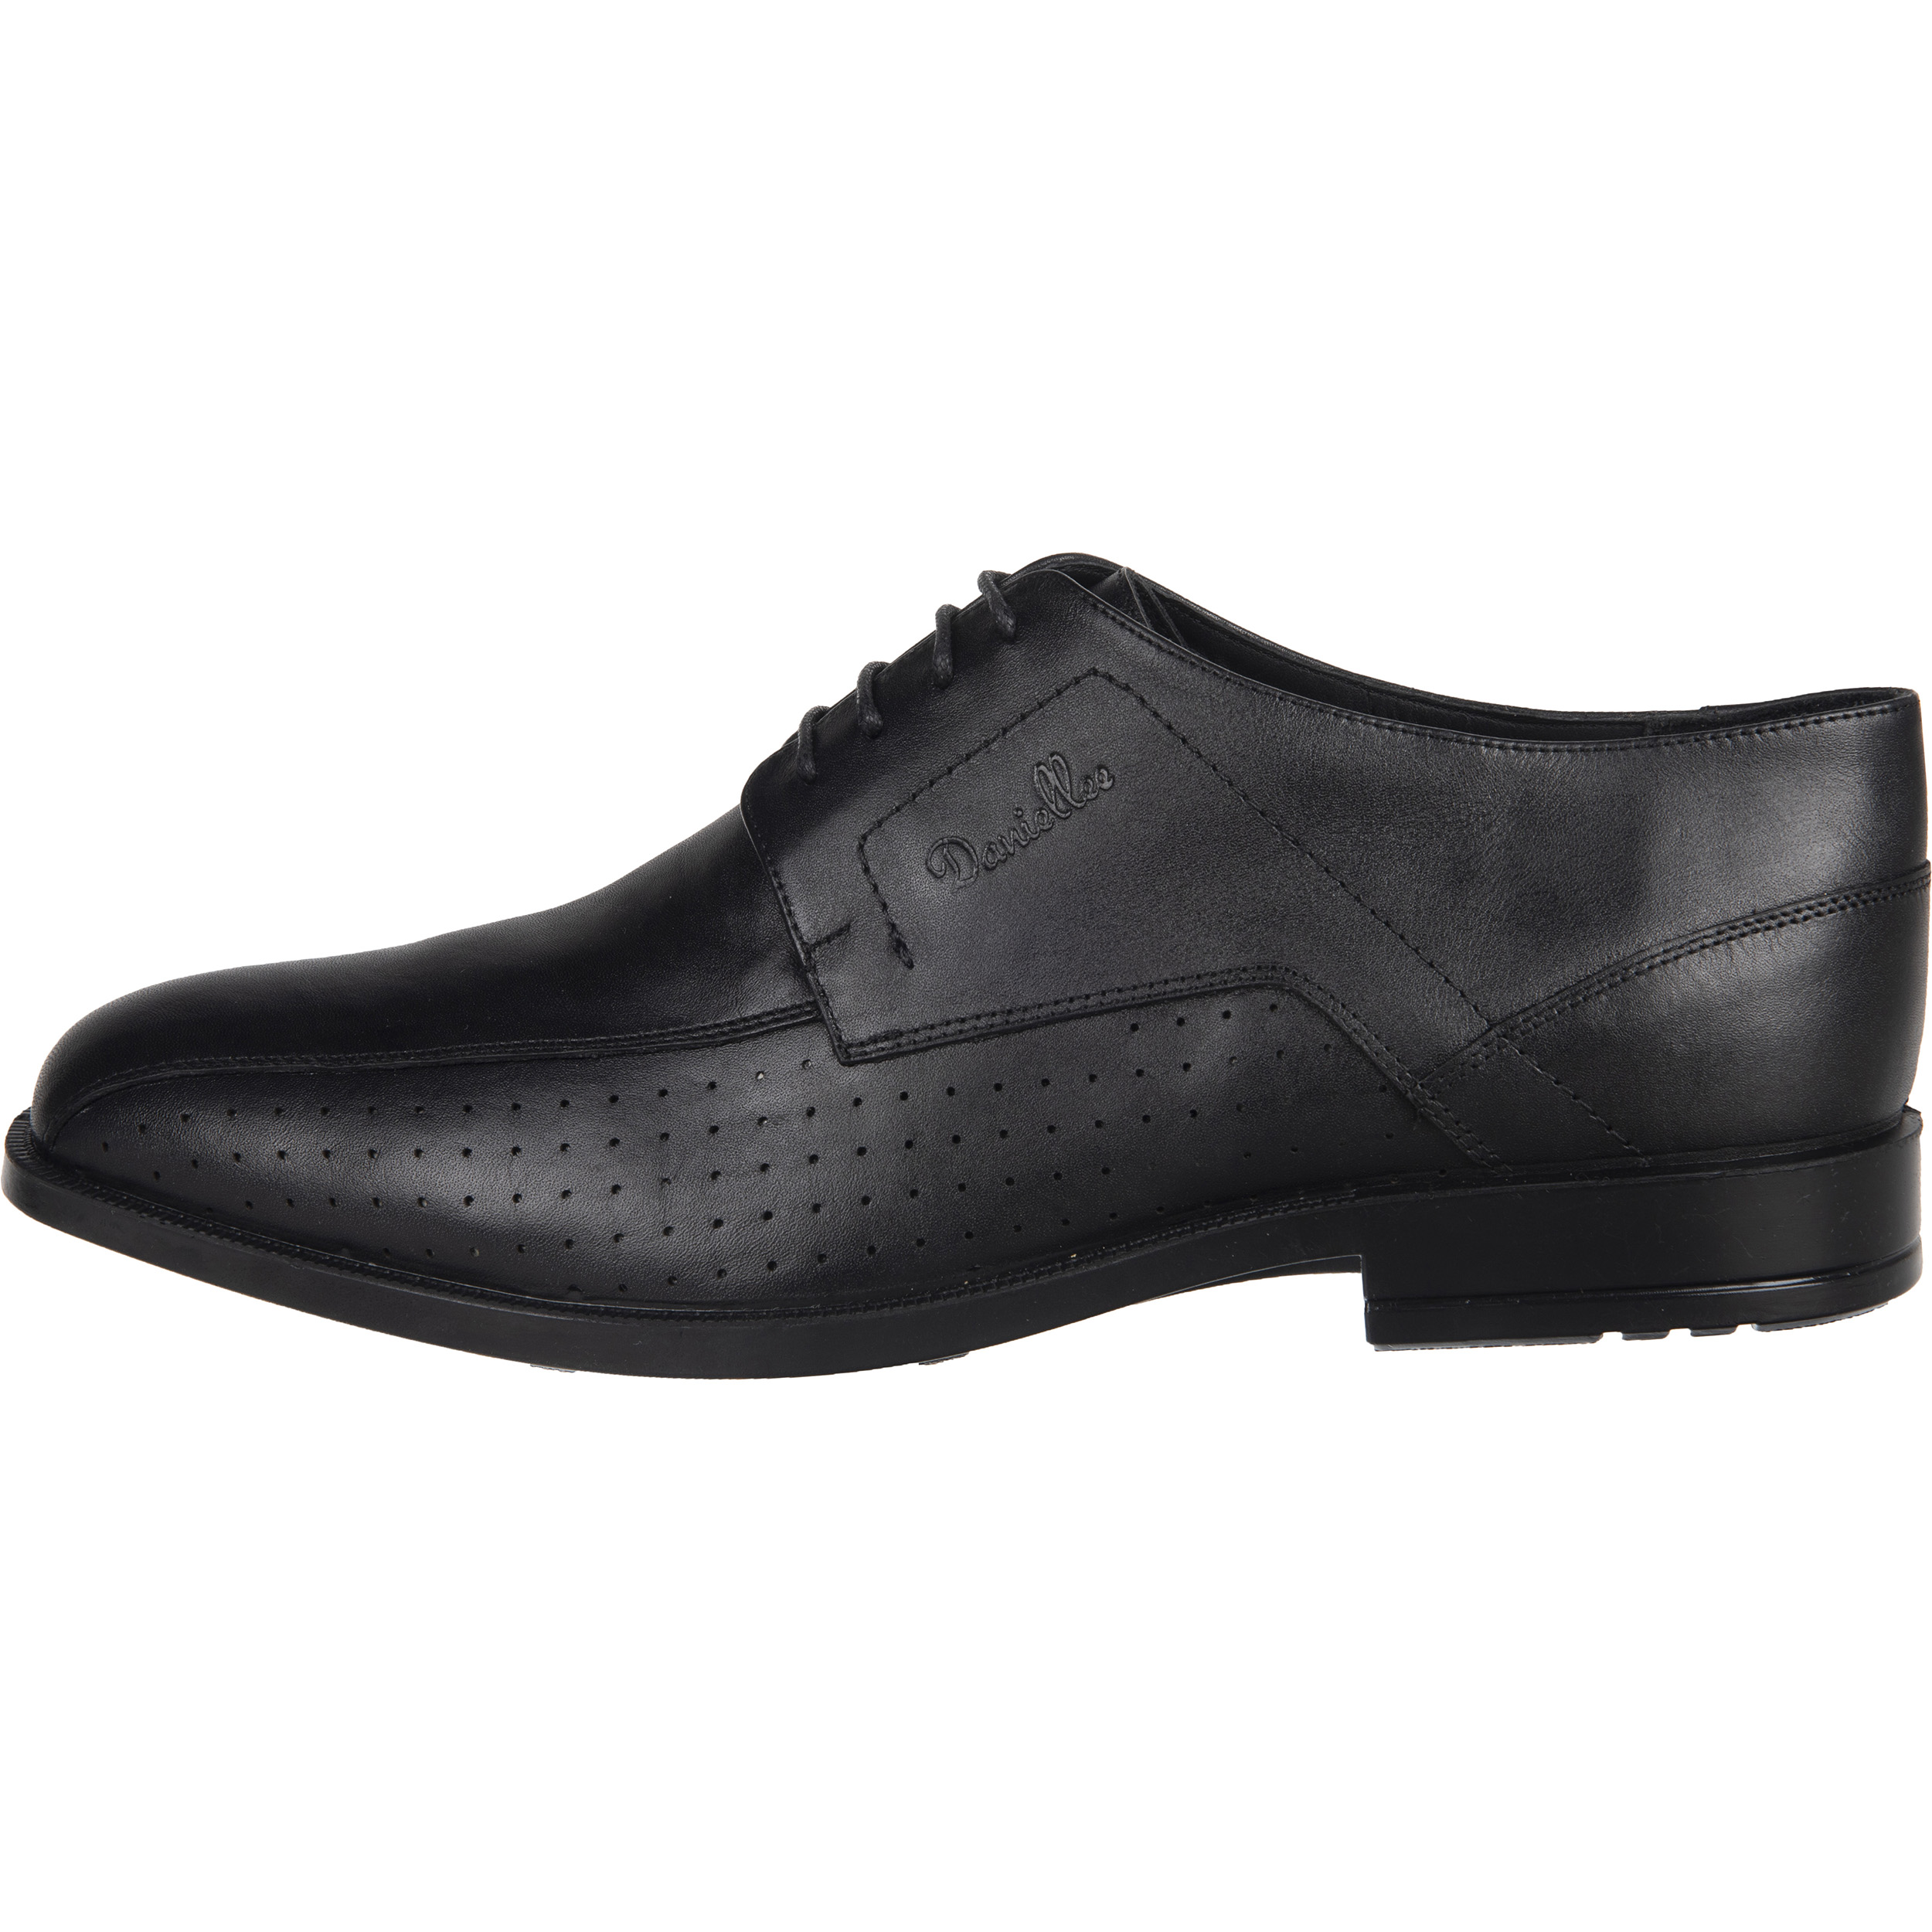 کفش مردانه دنیلی مدل 112070271001